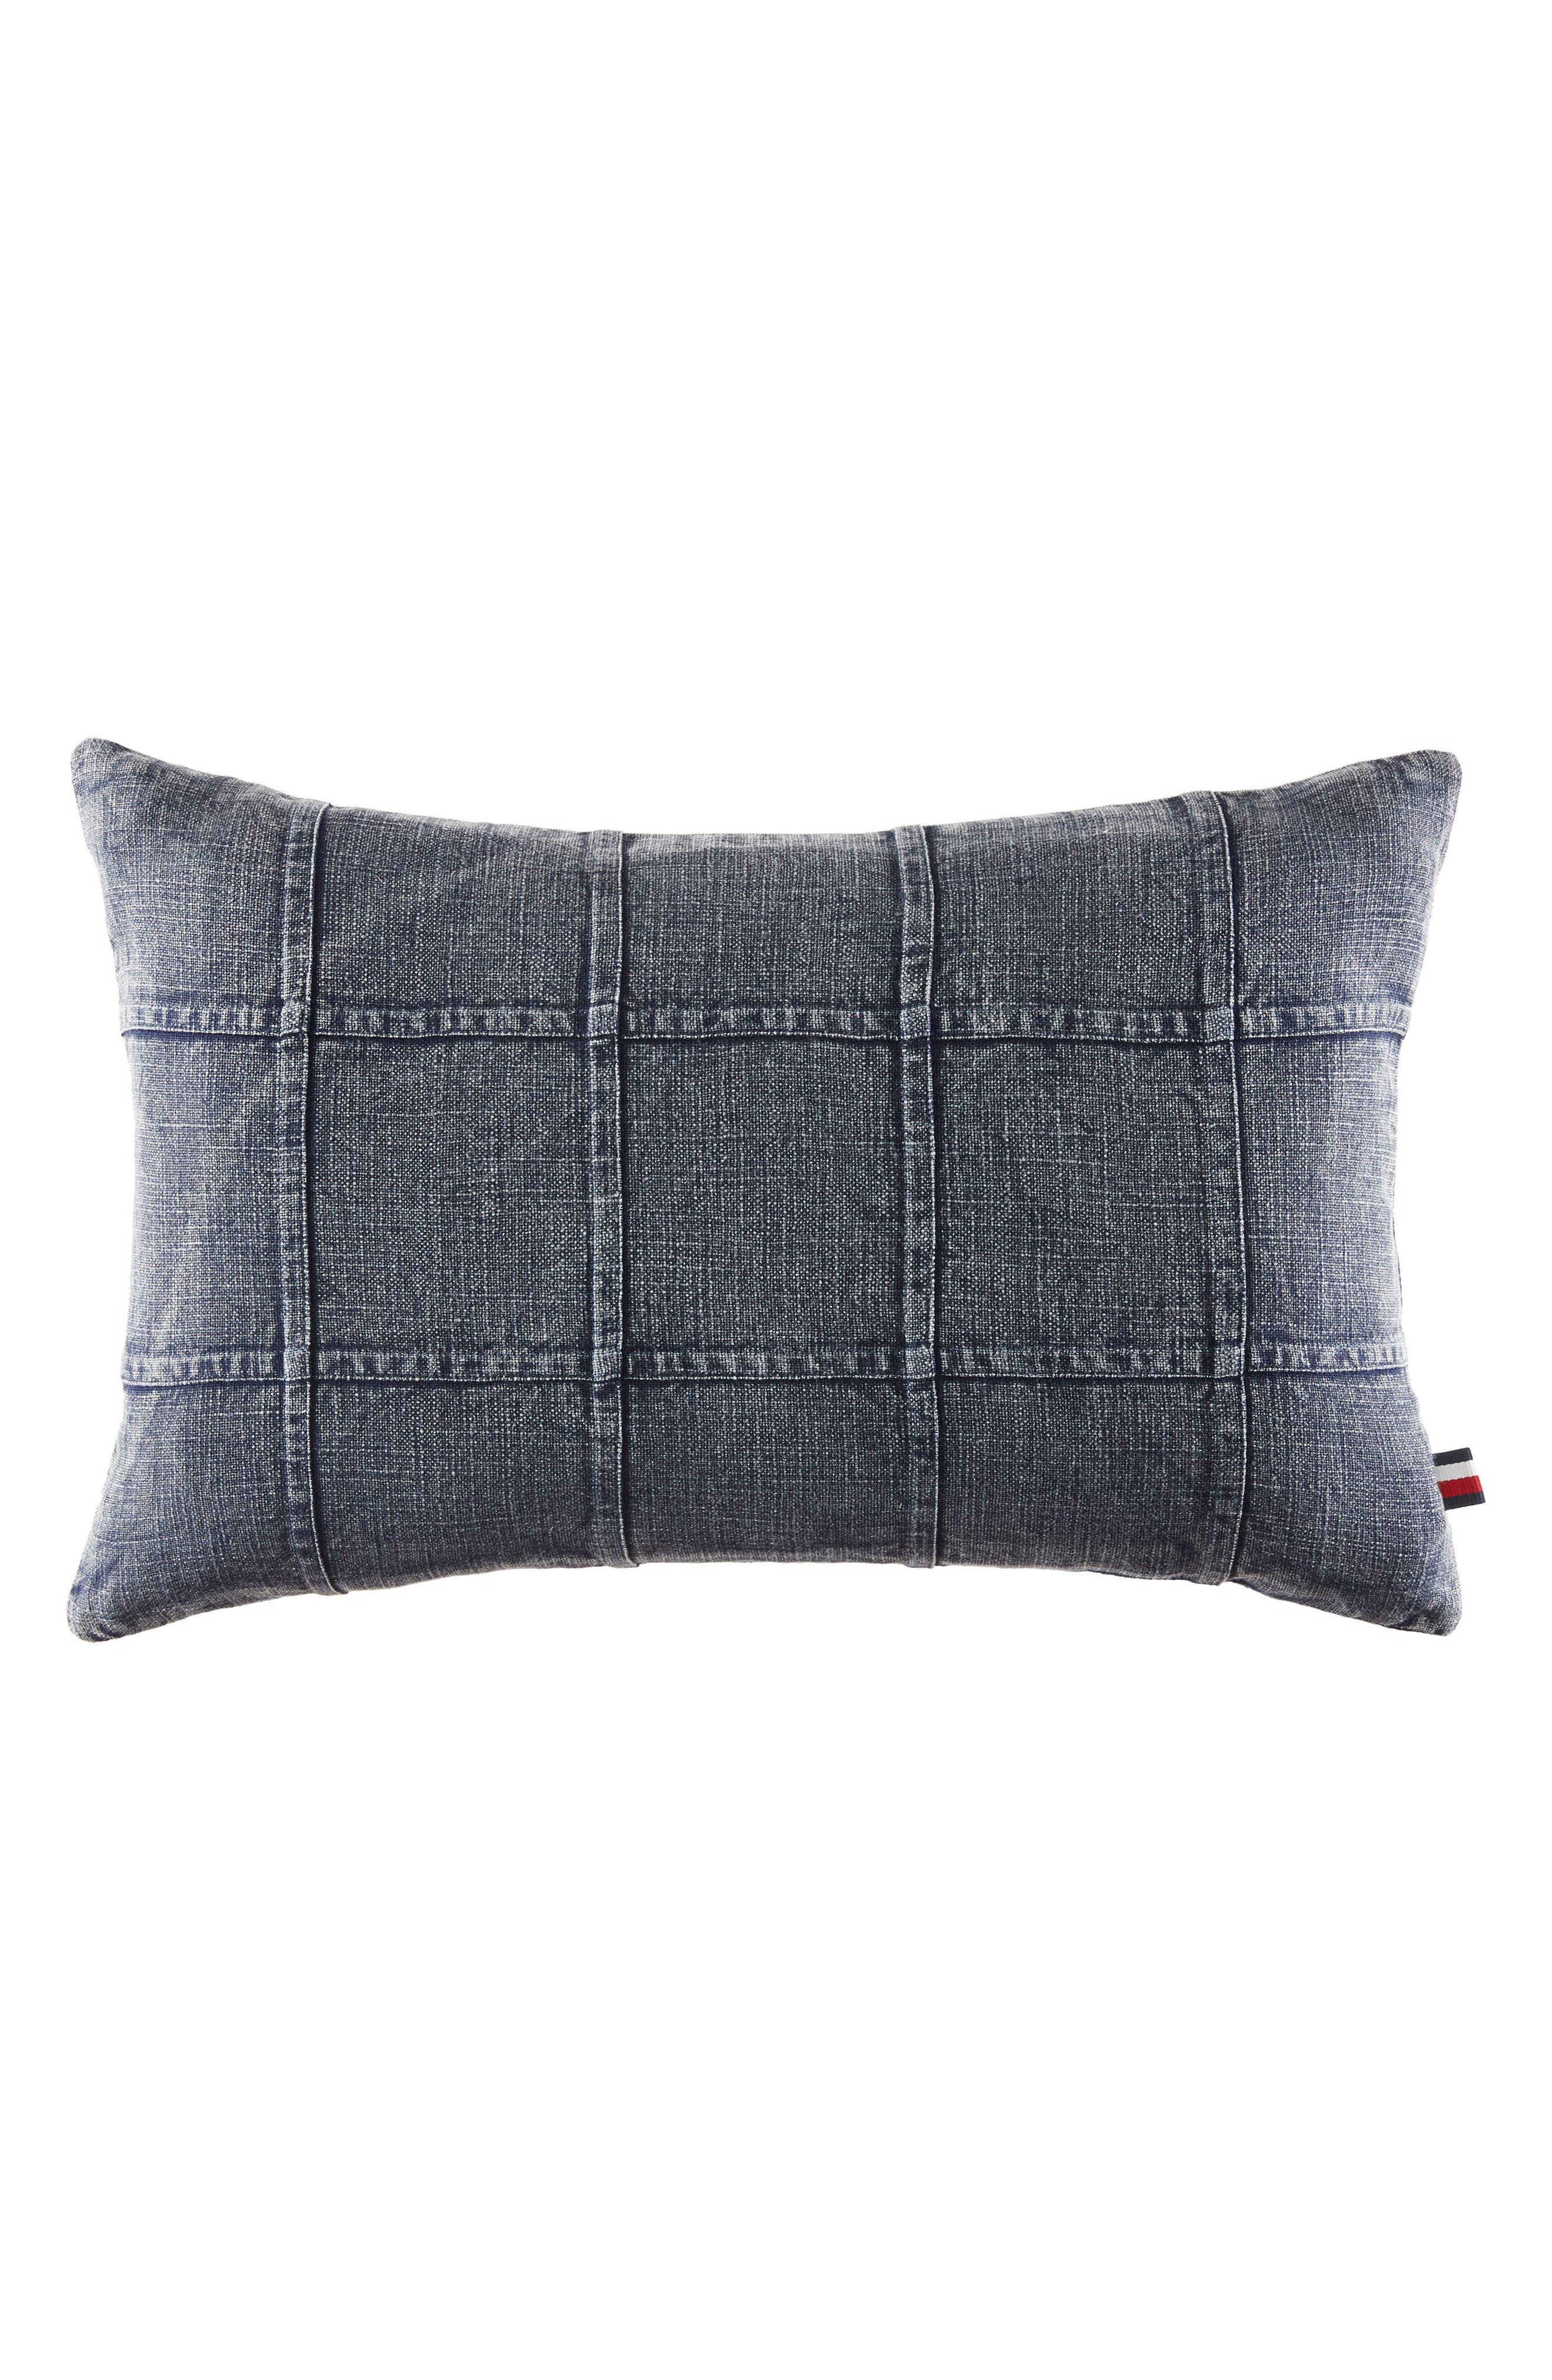 Dusted Indigo Denim Accent Pillow,                         Main,                         color, Denim Blue